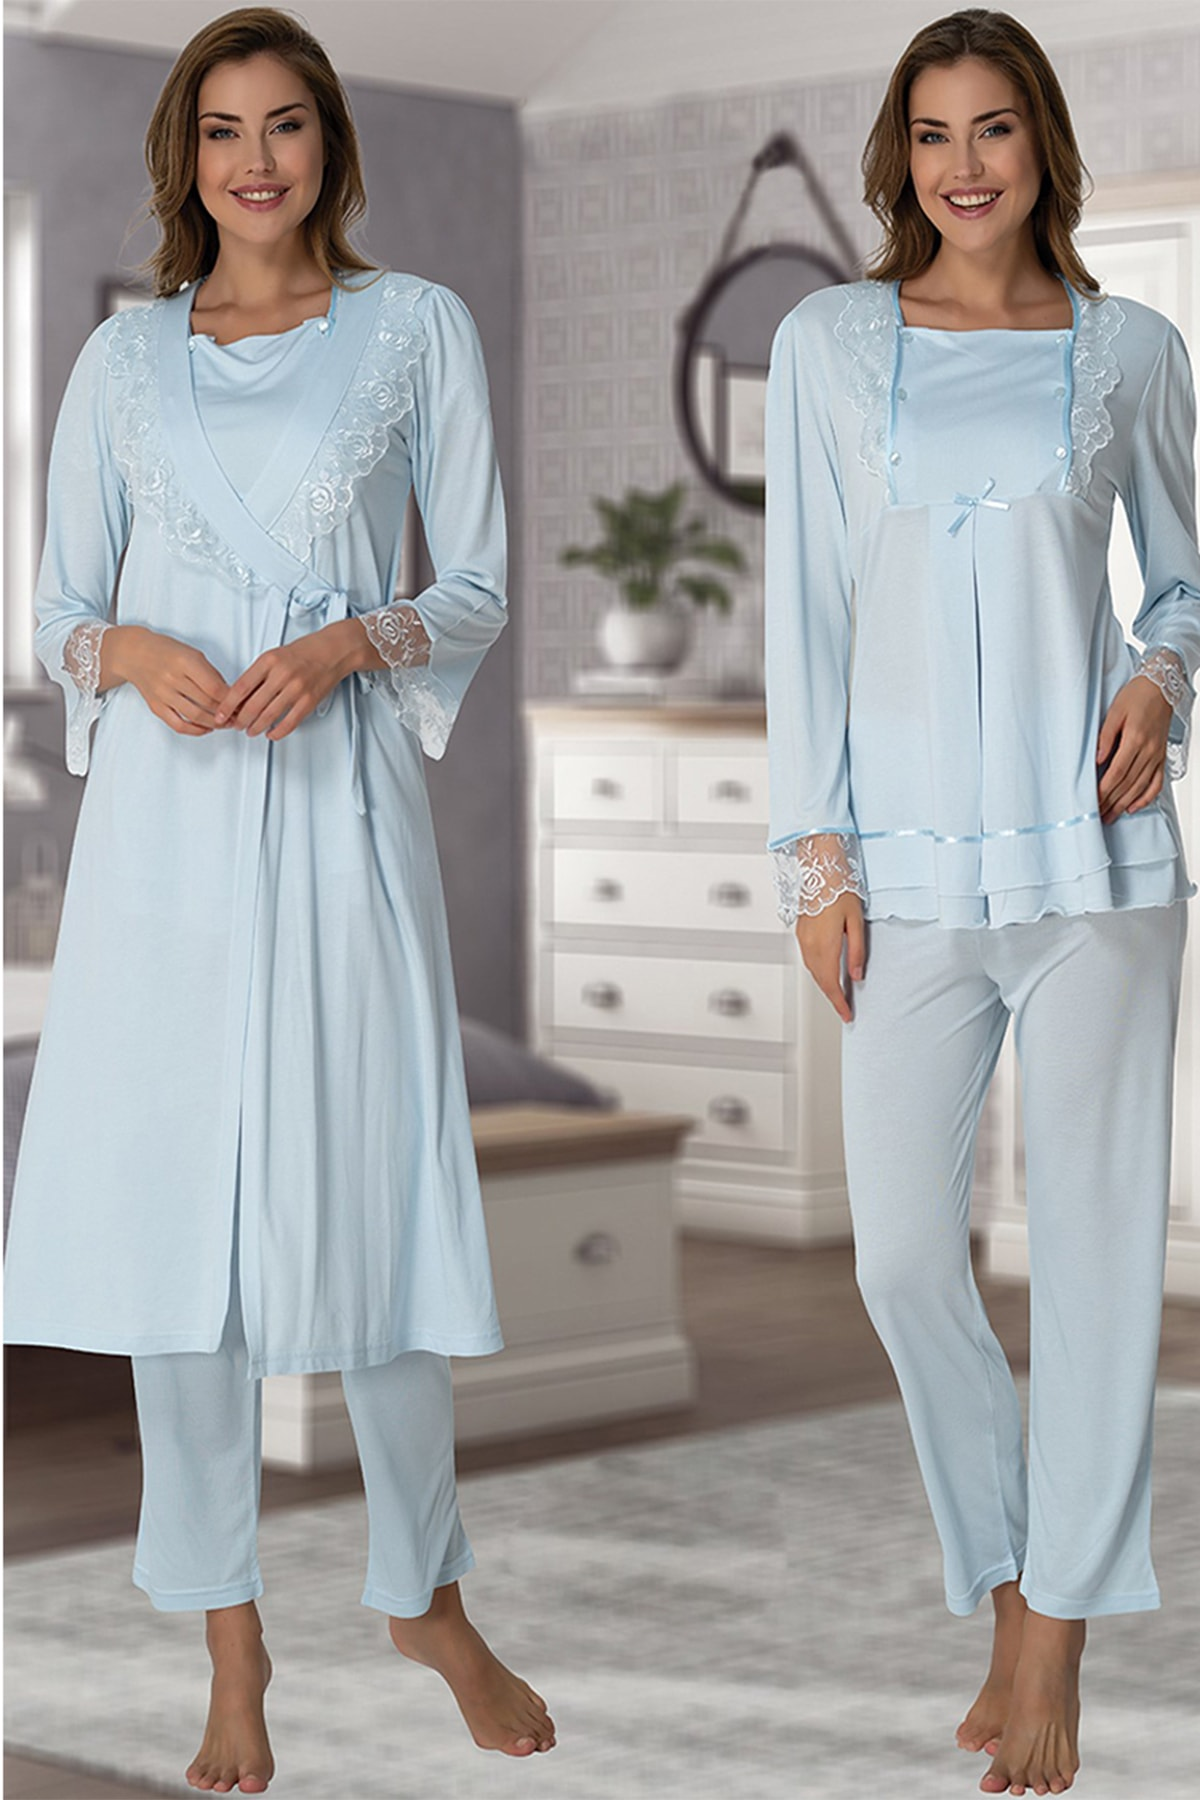 Effort Pajamas Women Velvet Dressing Gown Lohusa Pregnant Pajamas Set Cotton Comfortable Soft enlarge